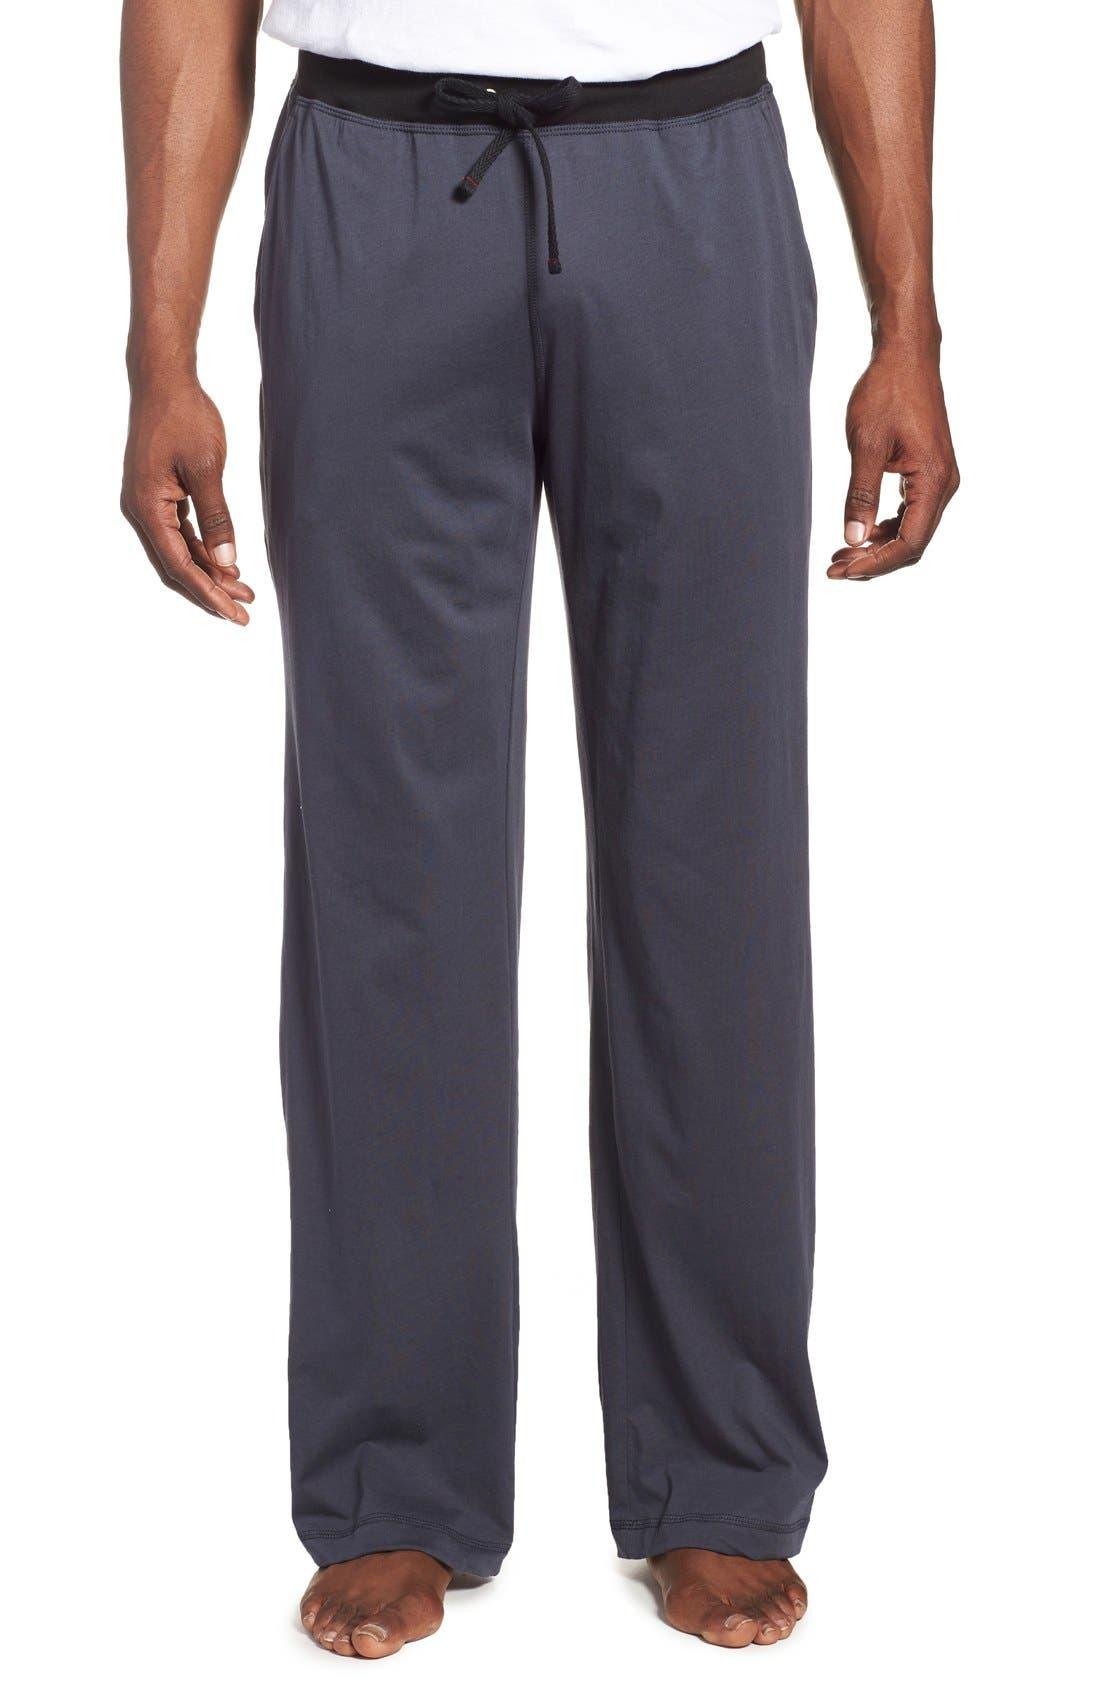 Daniel Buchler Peruvian Pima Cotton Lounge Pants